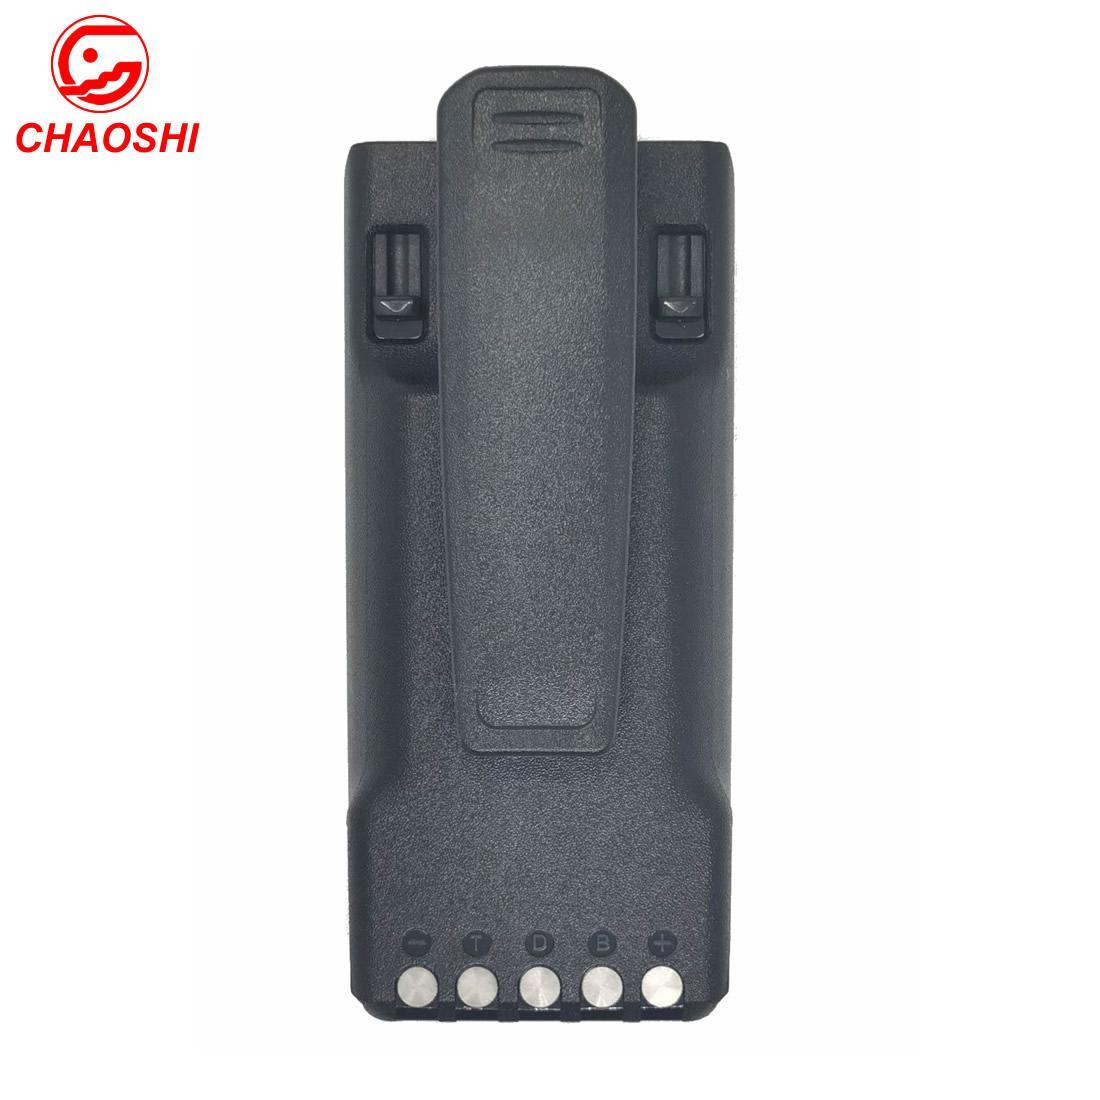 BP283對講機電池 IC-F3400D, IC-F4400D, IC-F70 5